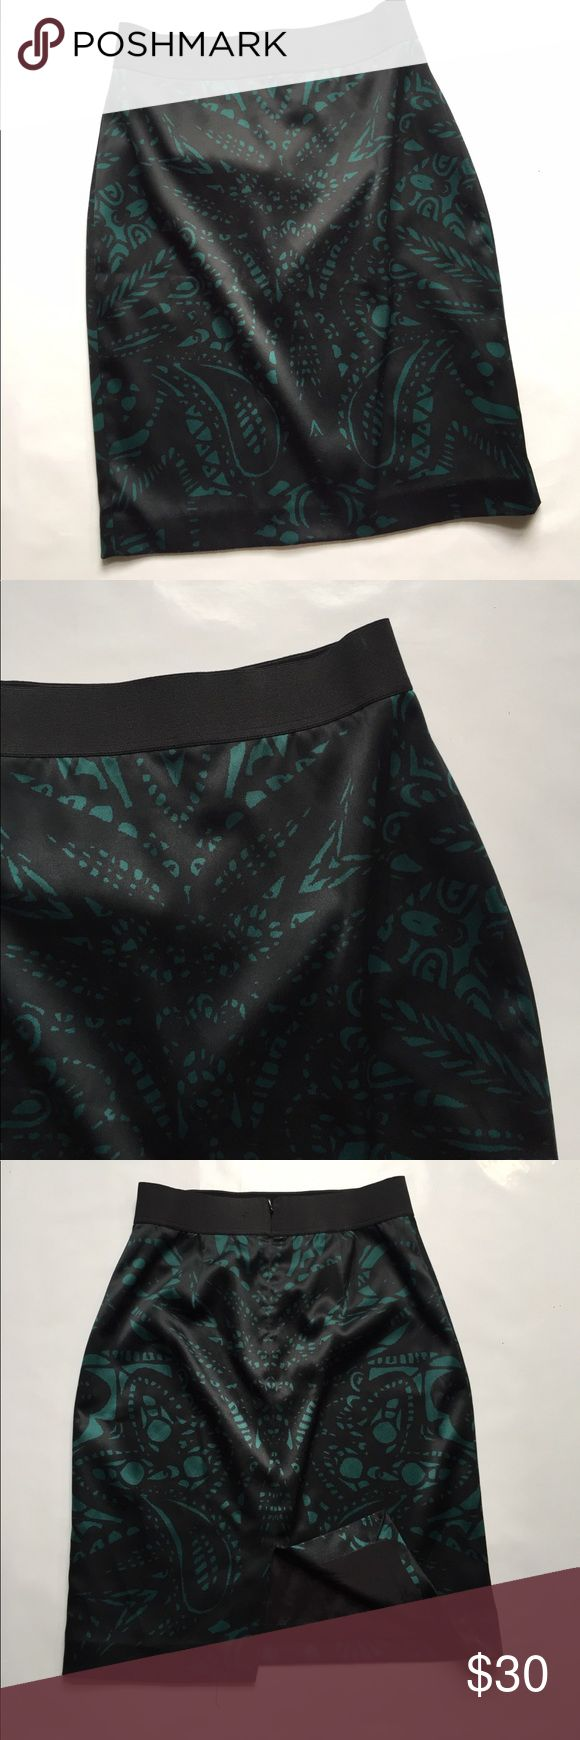 EXPRESS Green and black pencil skirt EXPRESS Green and black pencil skirt // matching top in closet Express Skirts Pencil